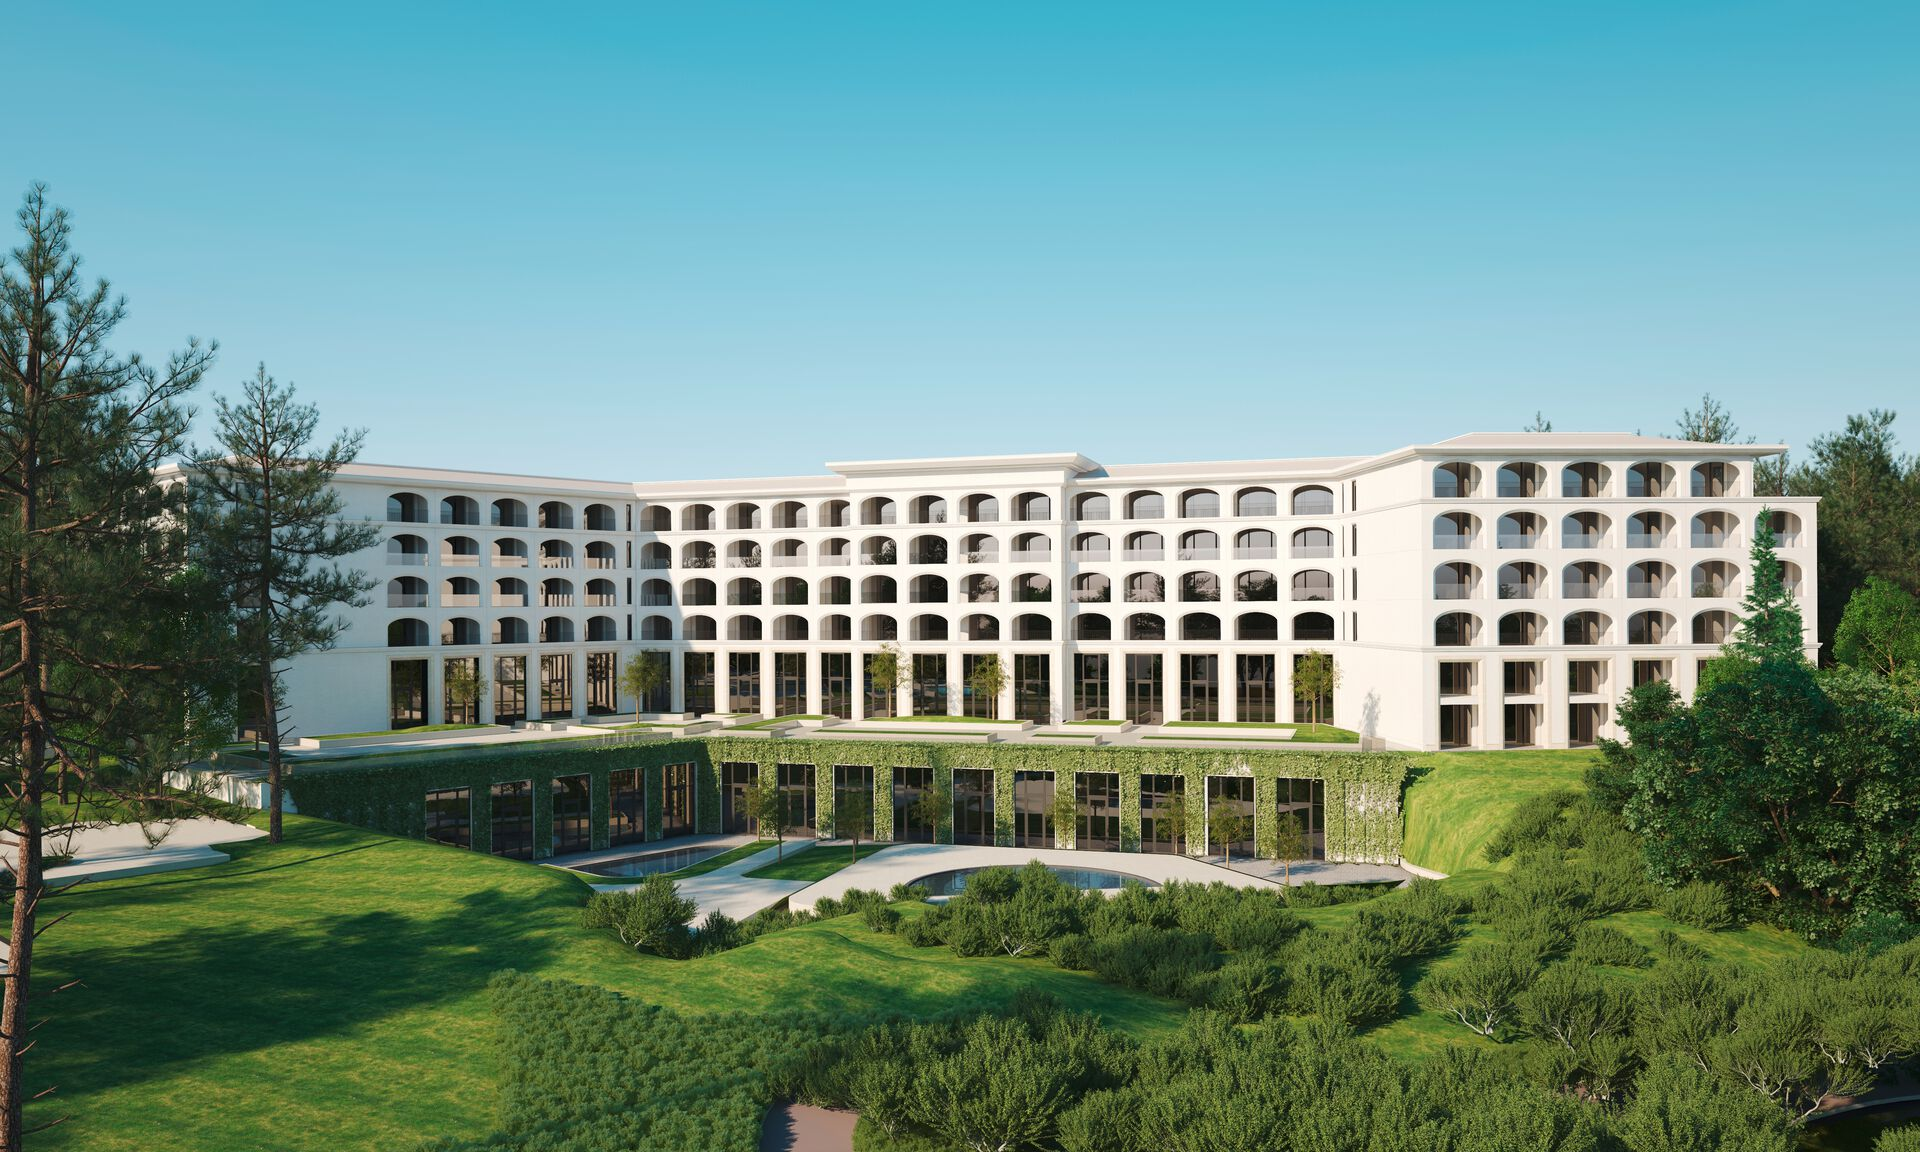 Aquahouse Hotel & SPA - NEUERÖFFNUNG 2022